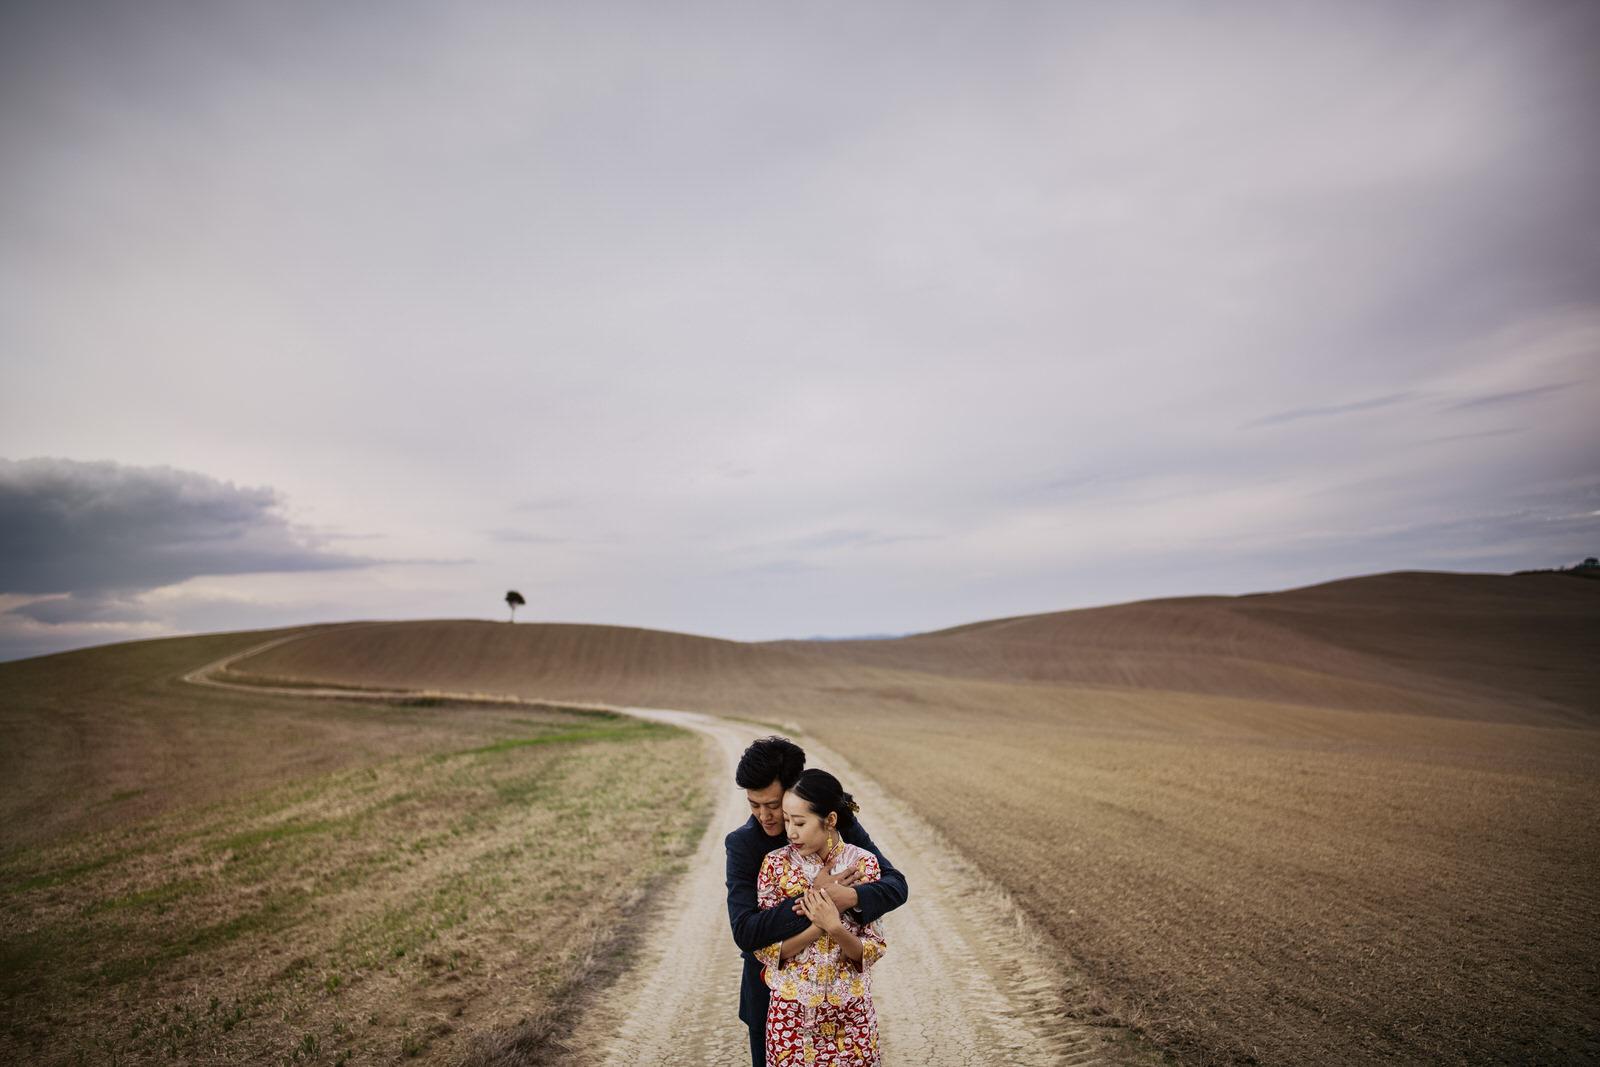 wedding photographer in italy-venice-tuscany-florence-amalfi coast-como lake-villa del balbianello-siena-amalfi-ravello-belmond-villa cimbrone57